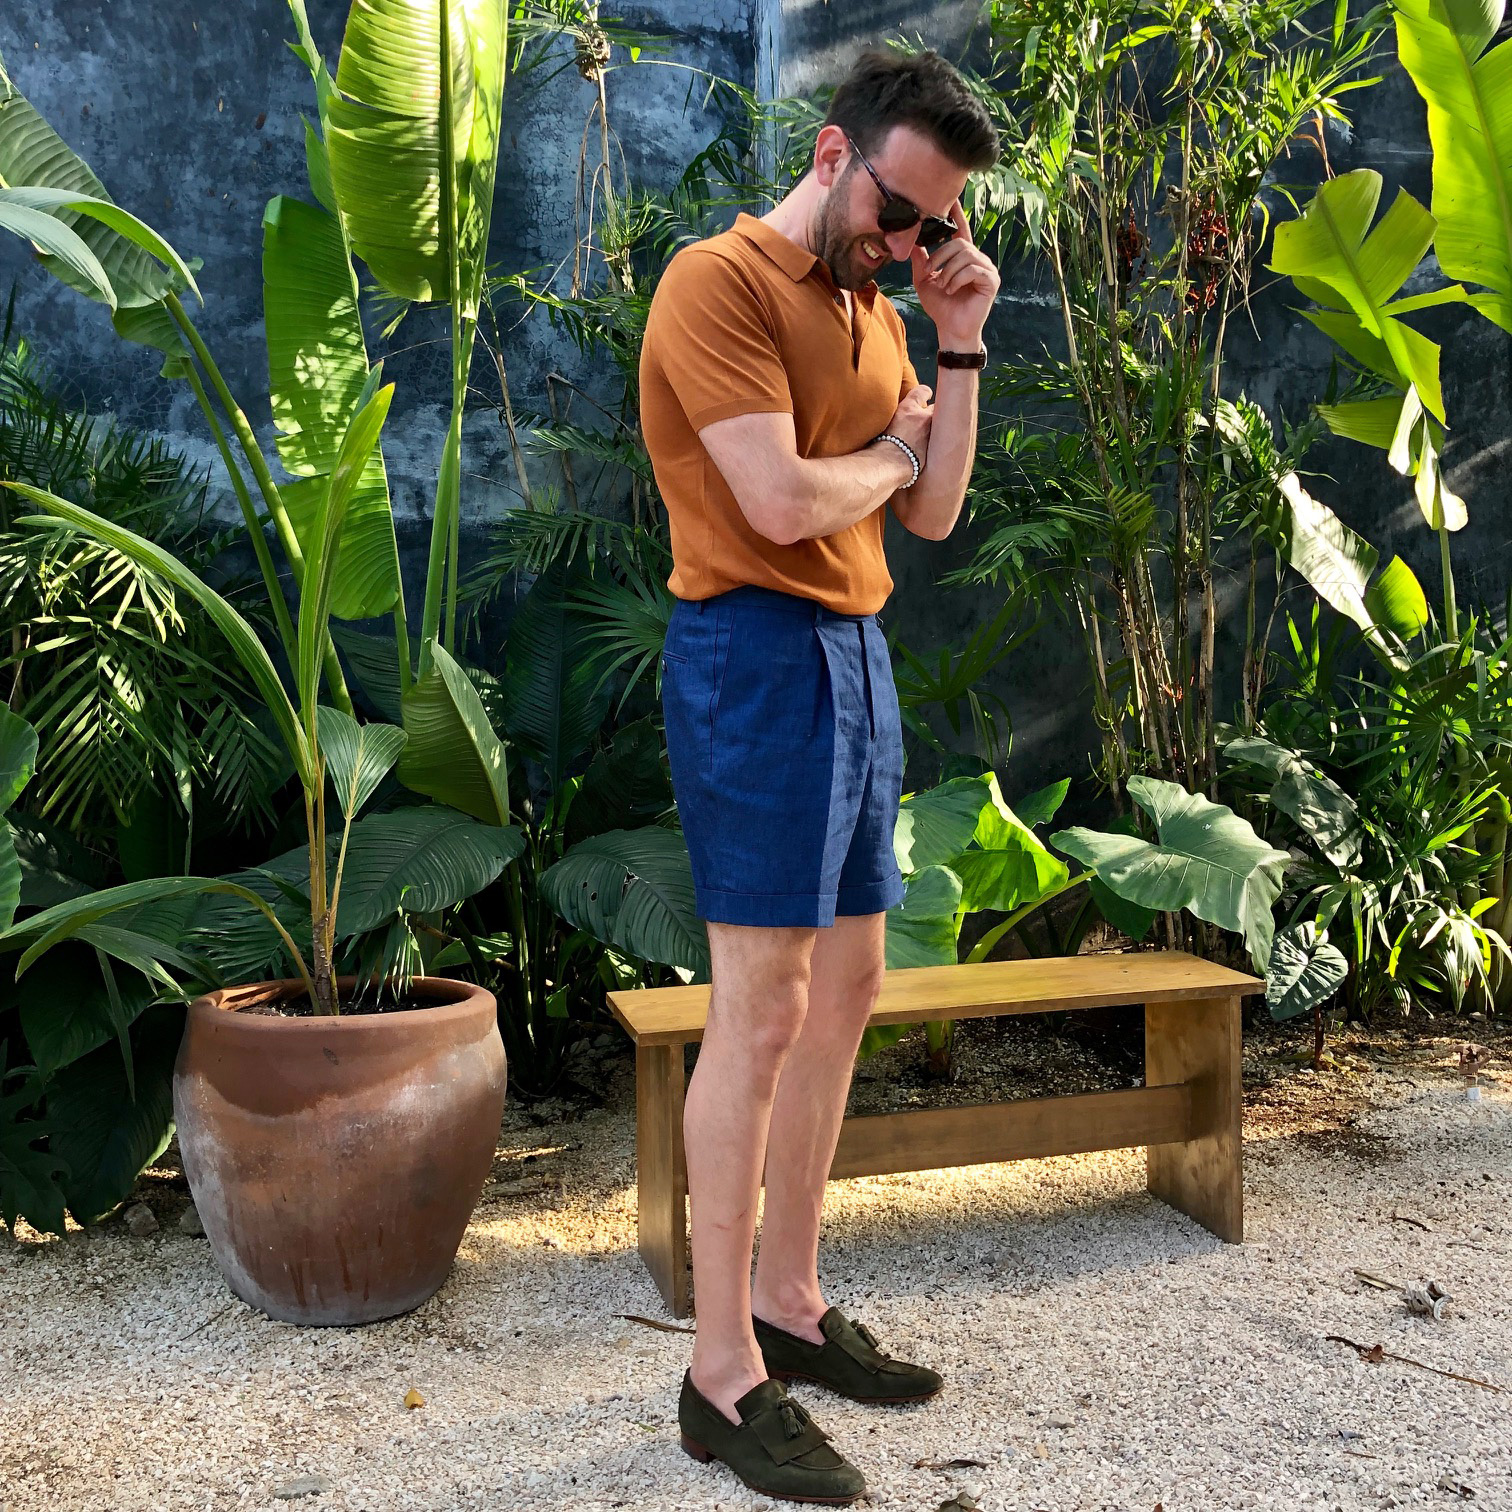 Carl Nave Tailored Tulum Navy Linen Shorts Cotton Terracota Polo Bespoke